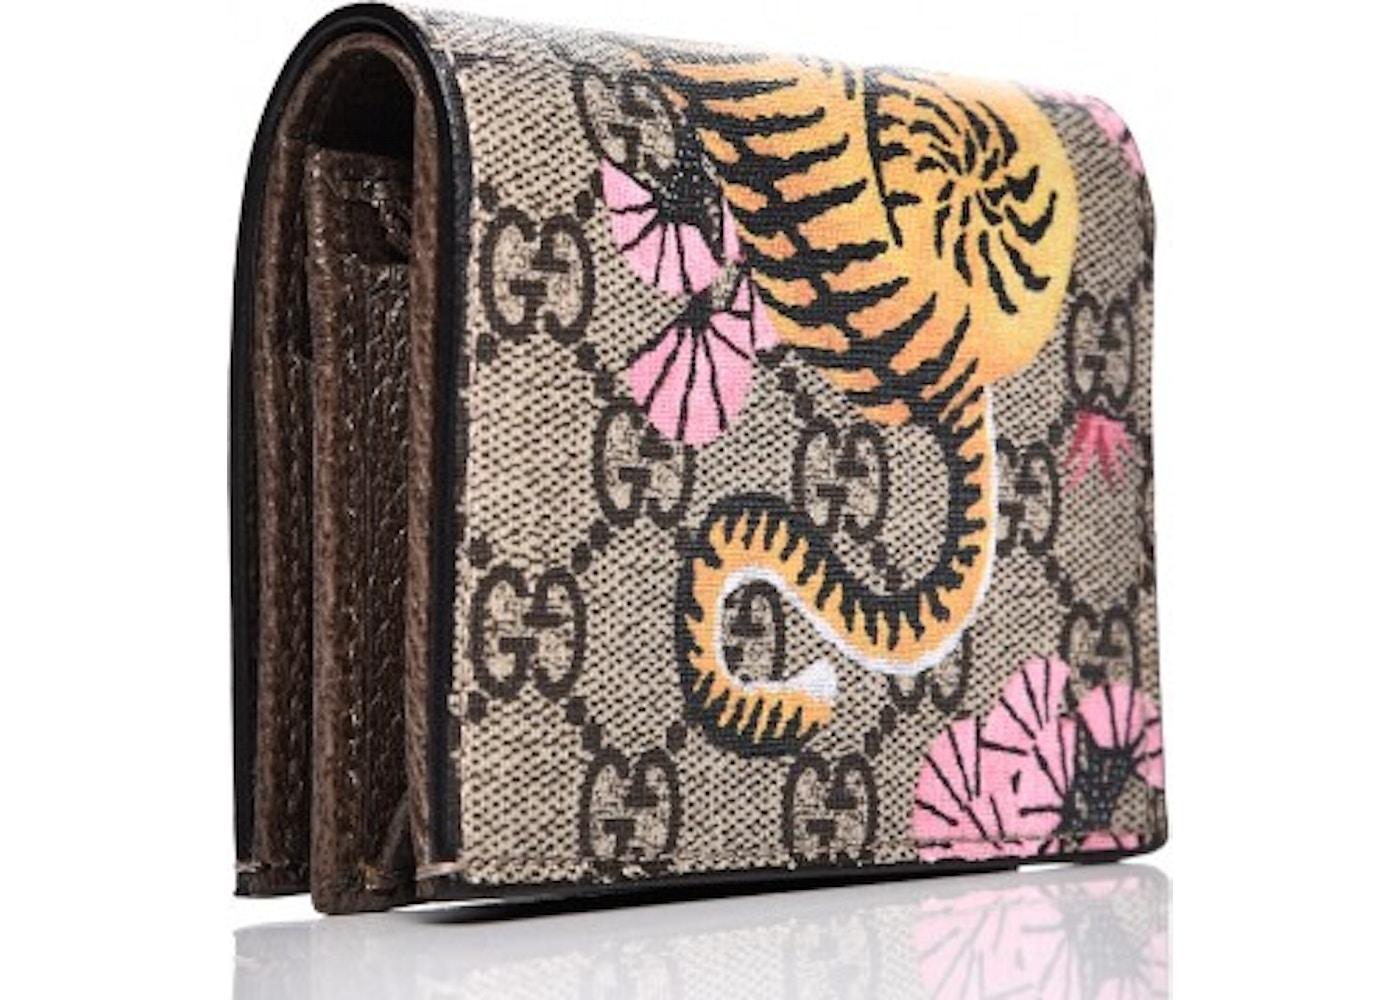 ae0fd254b5f Gucci Card Case Wallet Monogram GG Bengal Print Black Beige Orange Pink